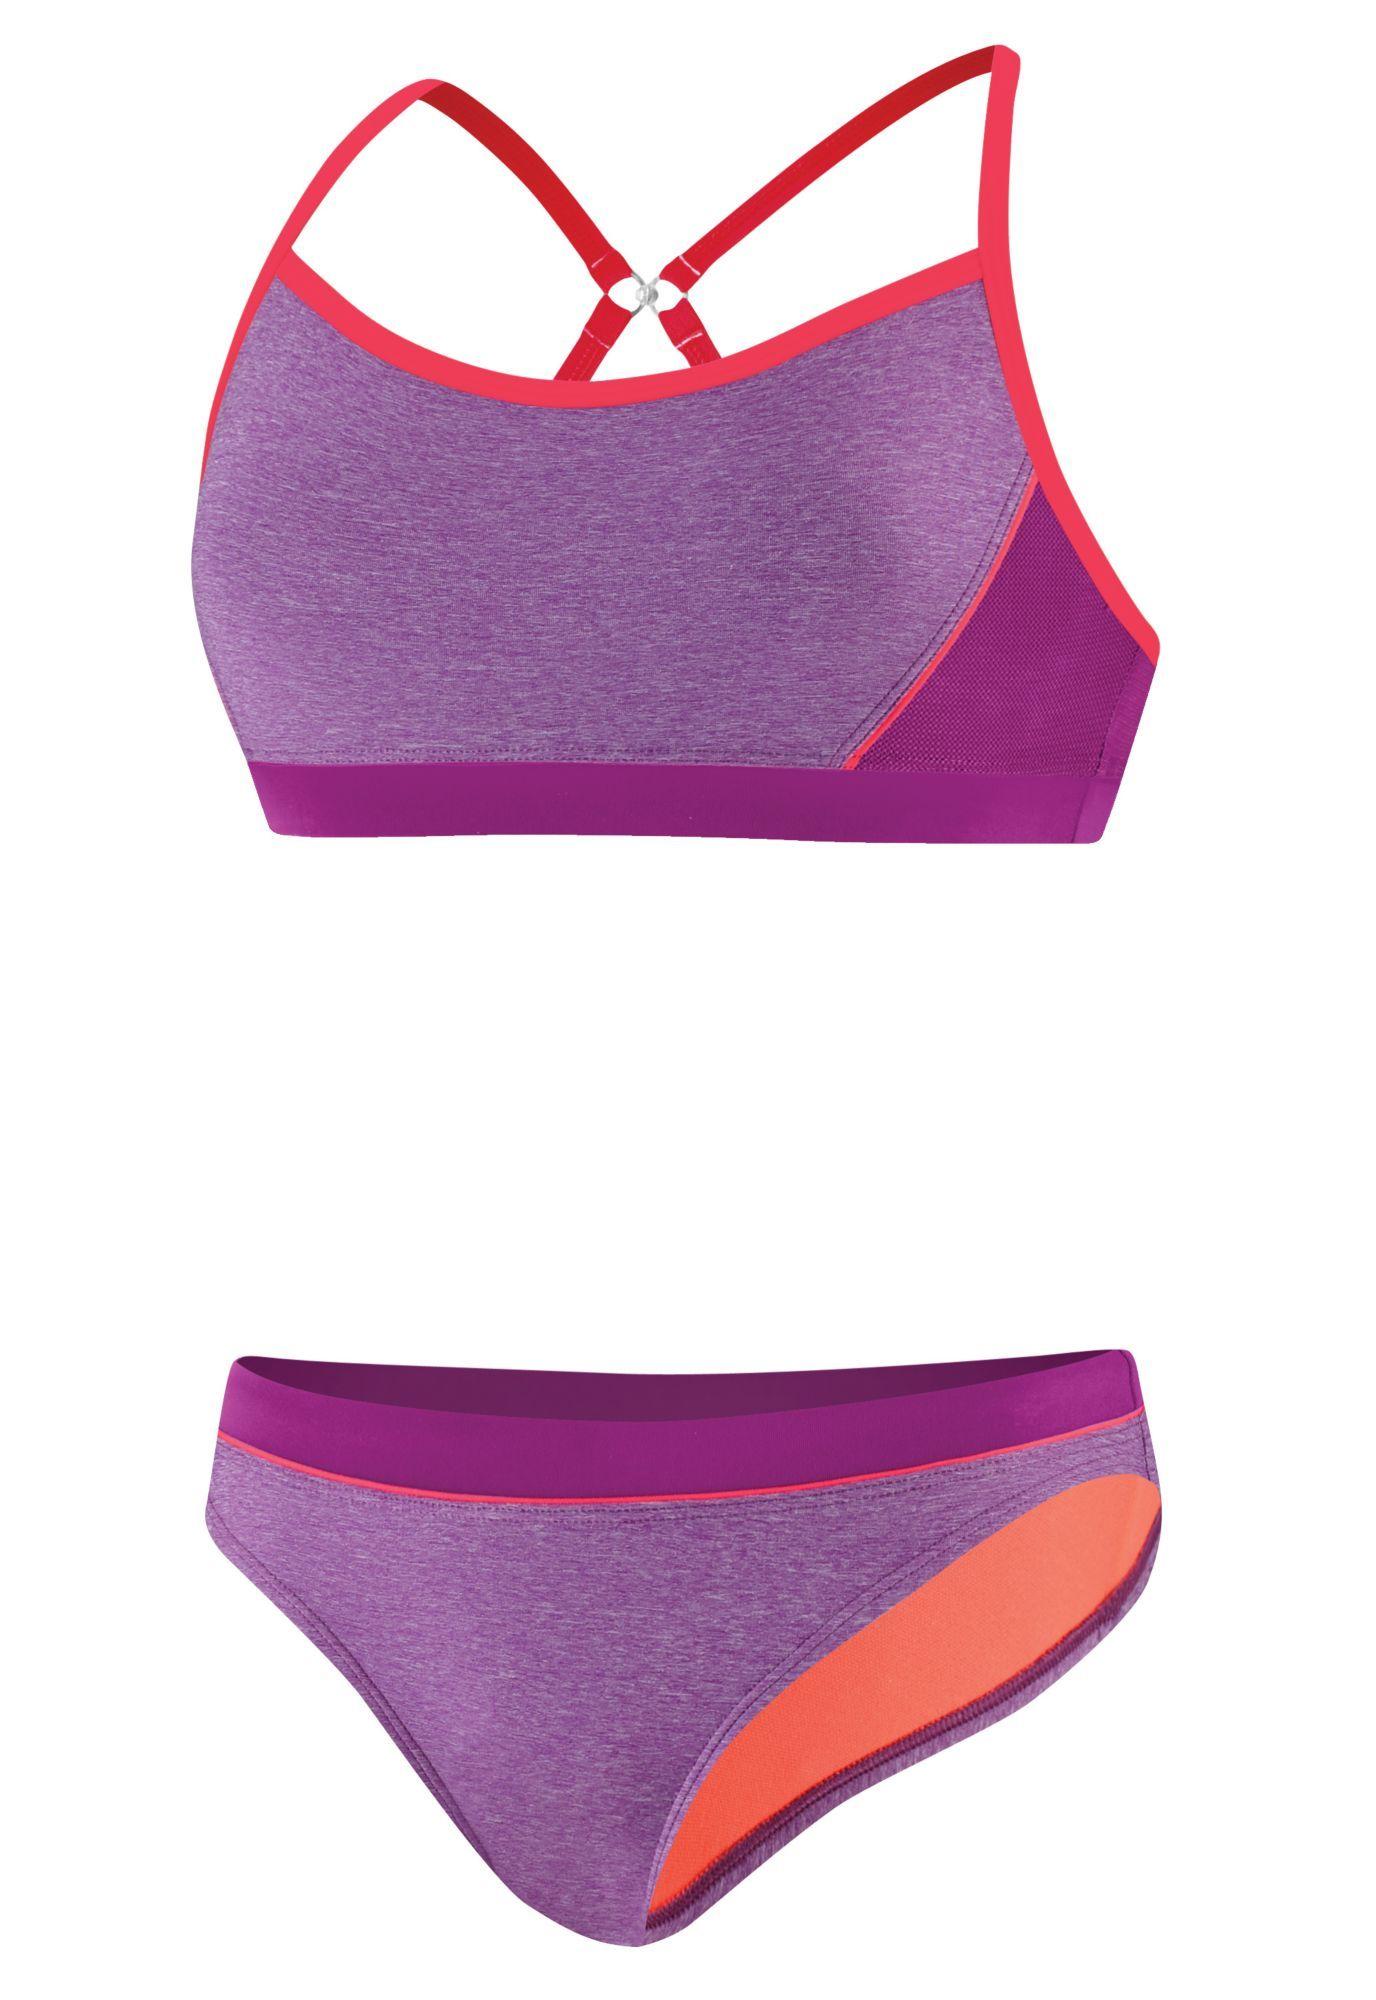 03c373e0 Speedo Women's Heathered Splice Clipback 2-Piece Swimsuit | Products ...